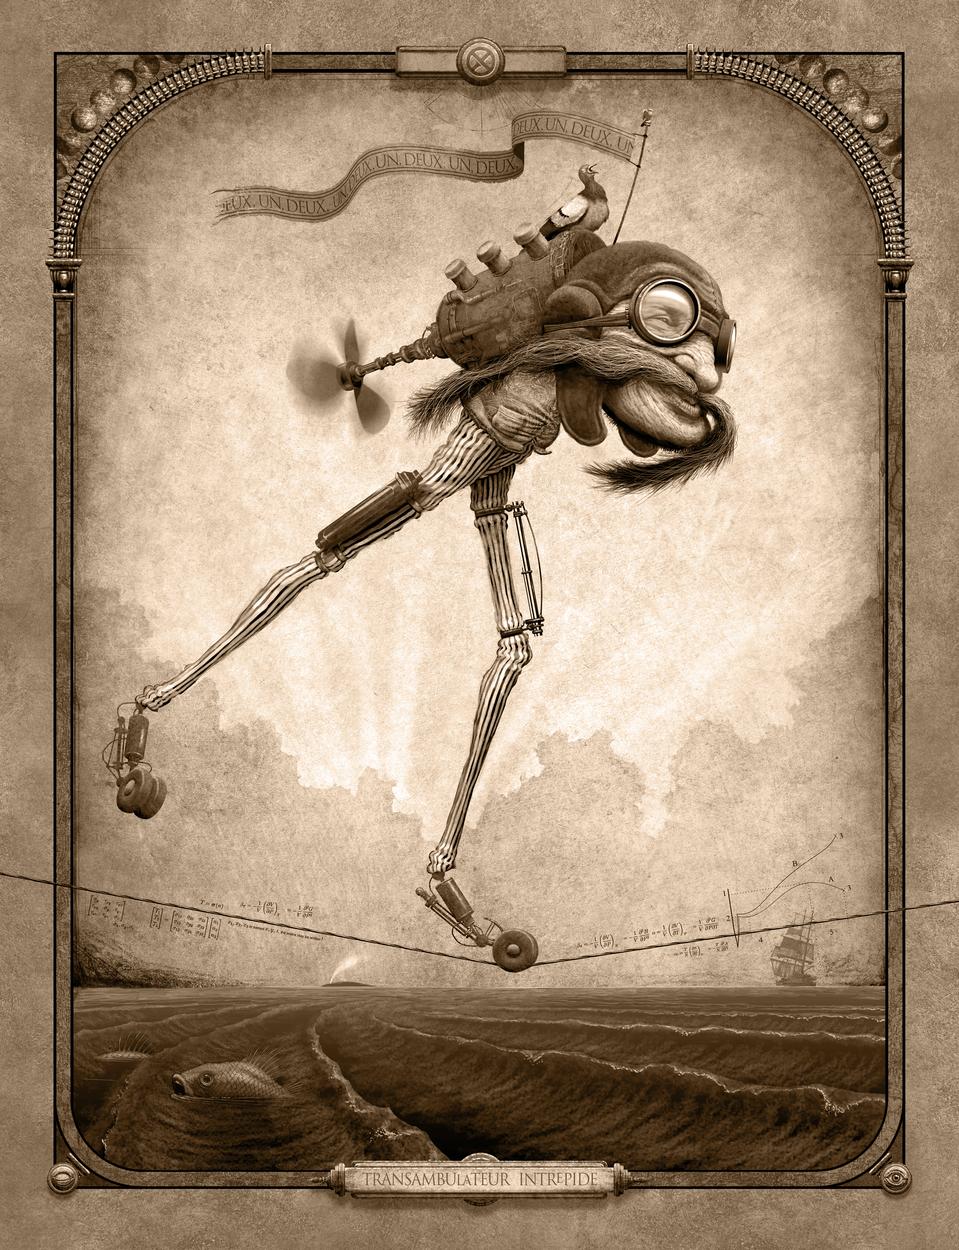 Transambulateur Intrepide  Artwork by Ed Binkley